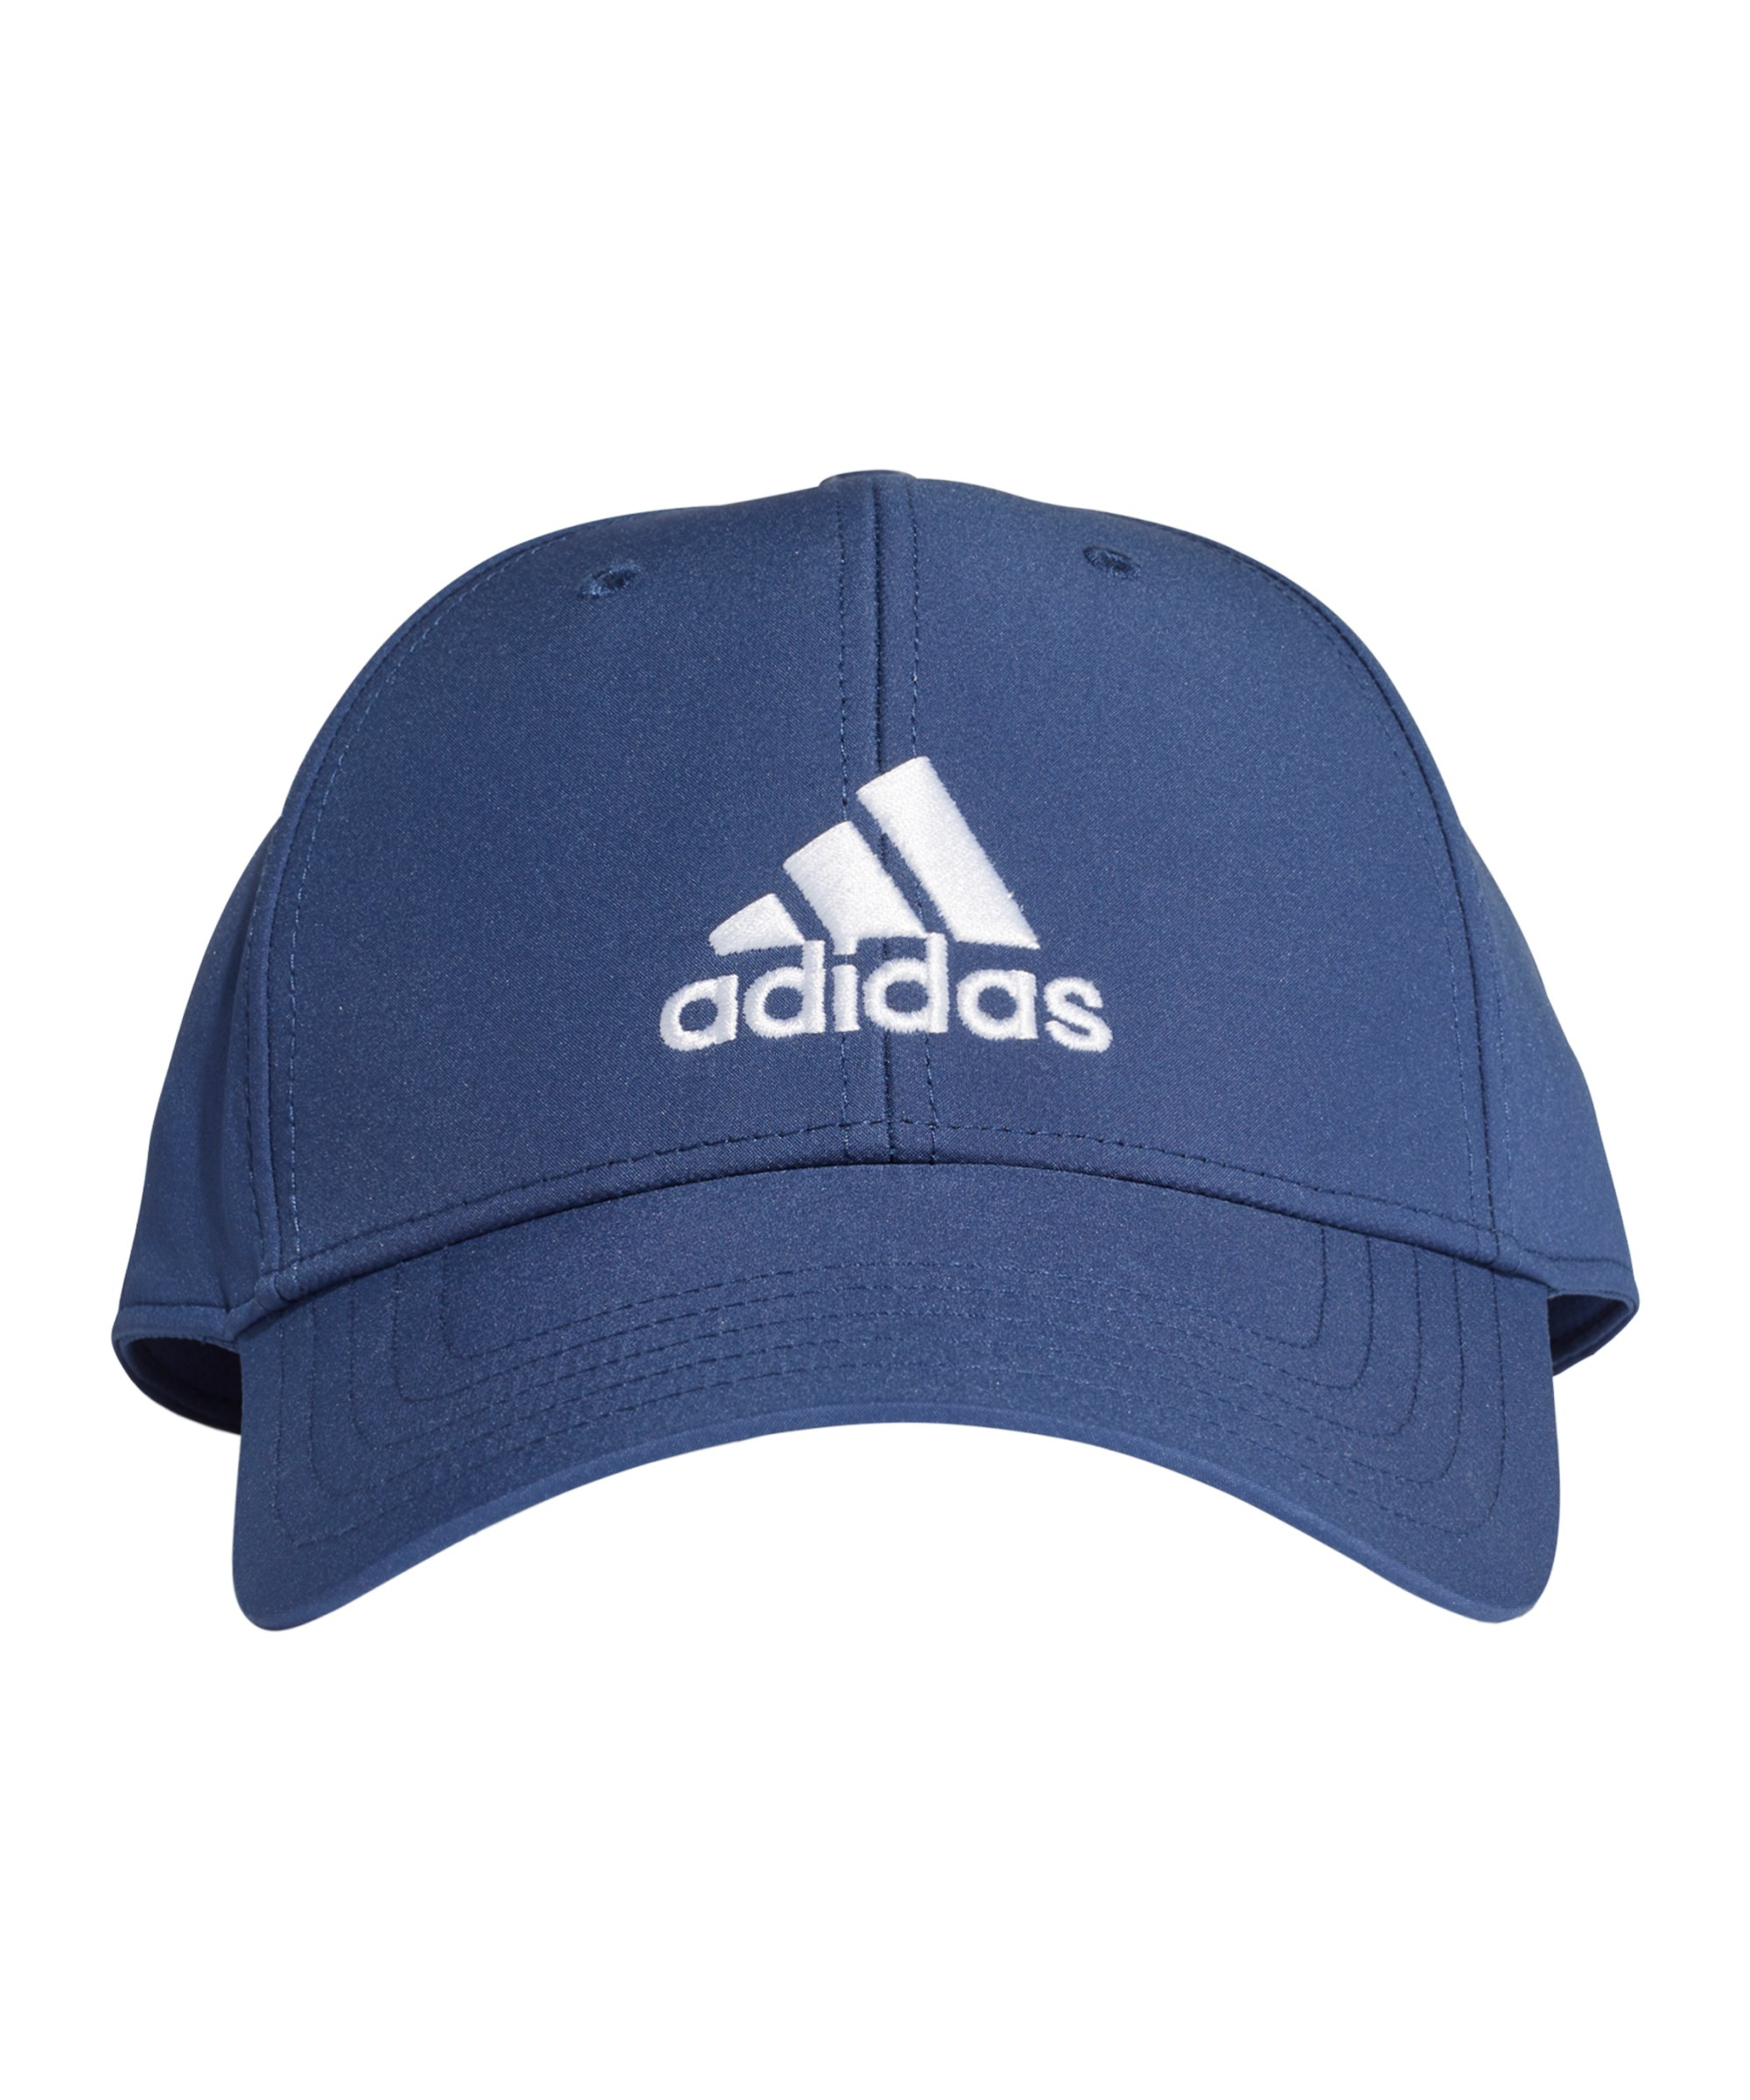 adidas Baseball Cap Kappe Blau - blau